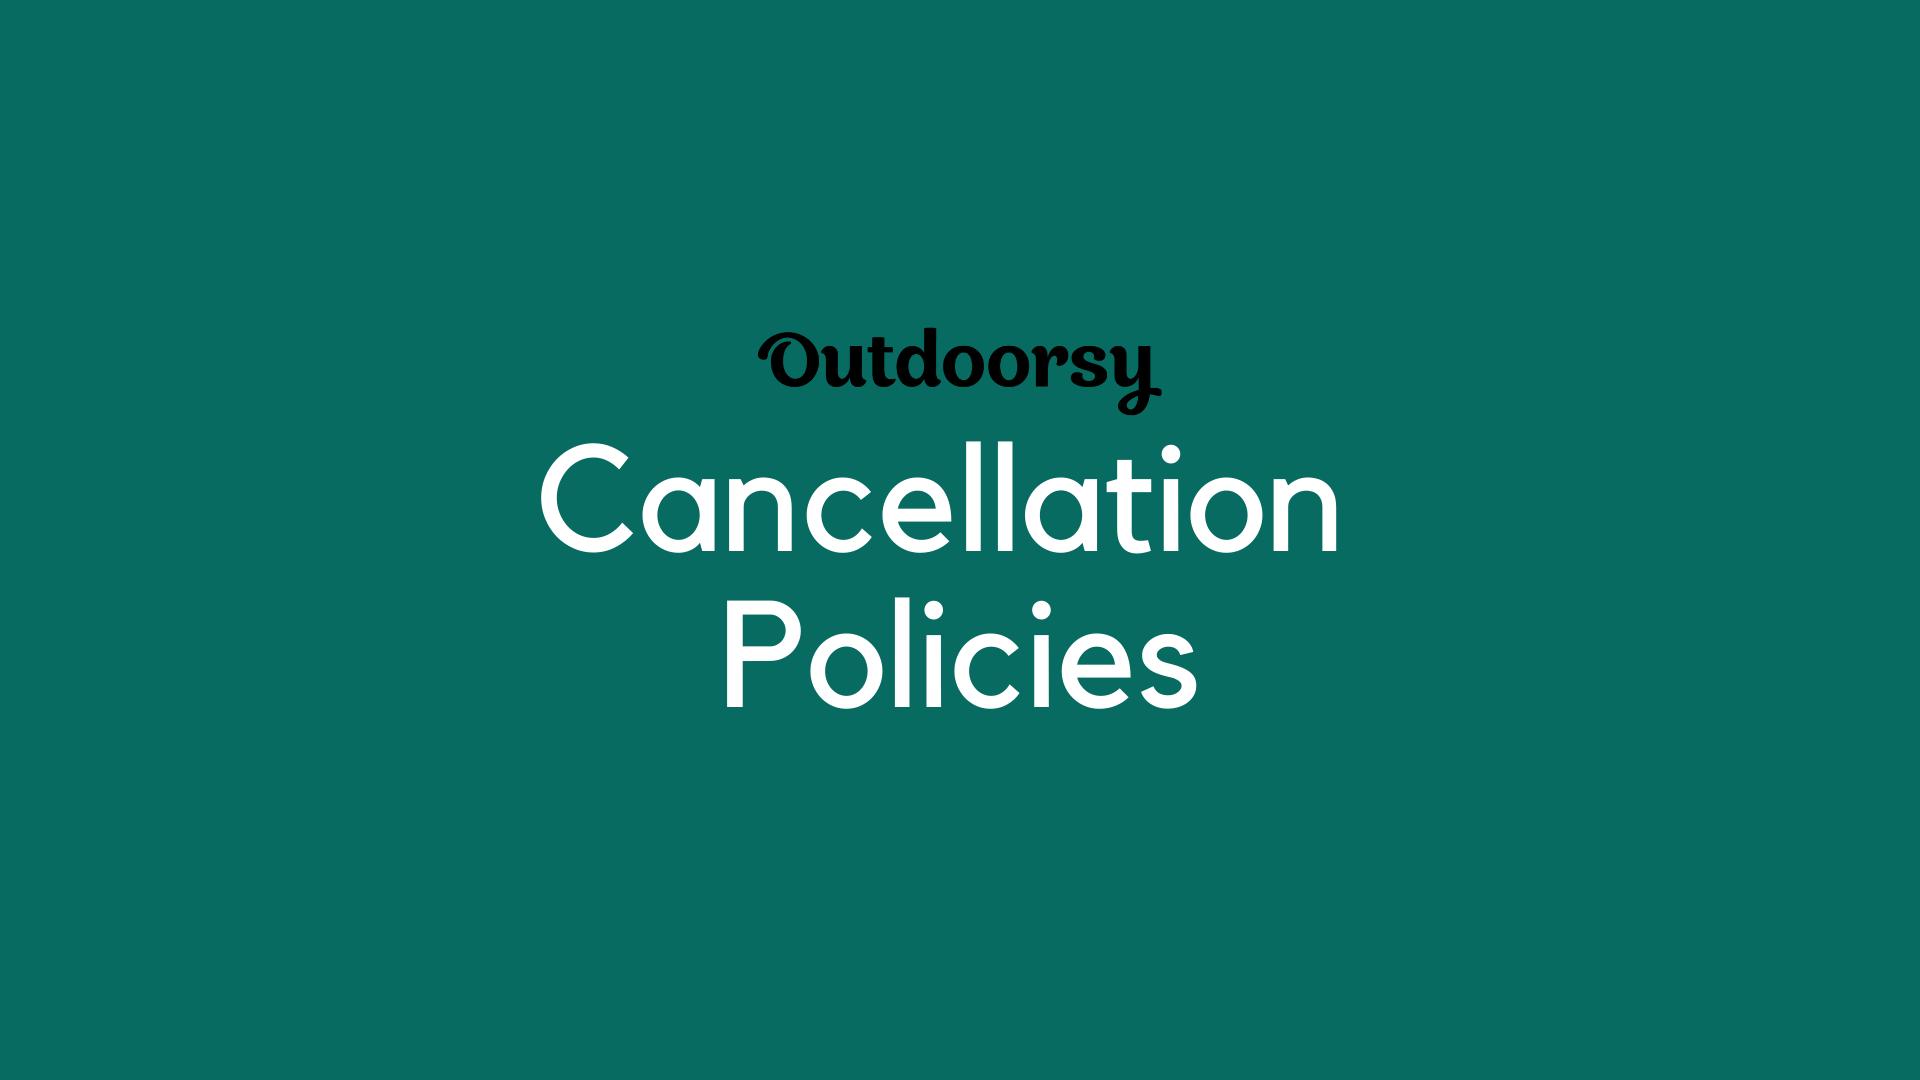 Outdoorsy Cancellation Policies: A Rundown